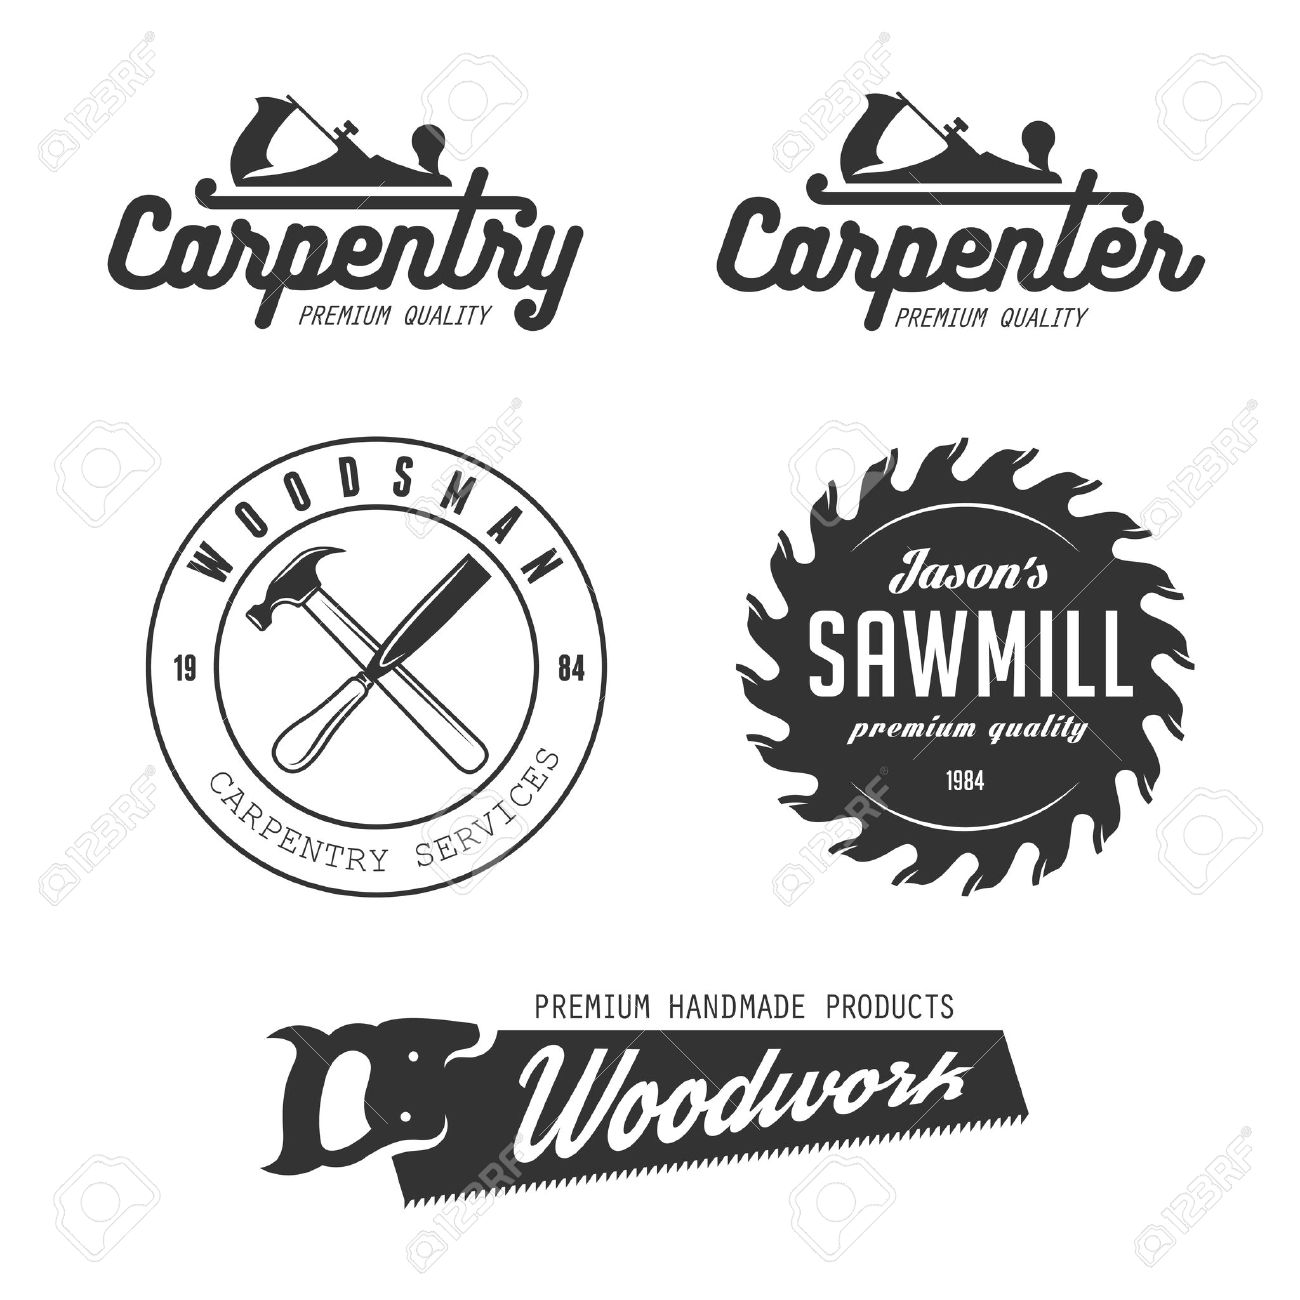 55e2da75b6a Carpenter Design Elements In Vintage Style For Logo